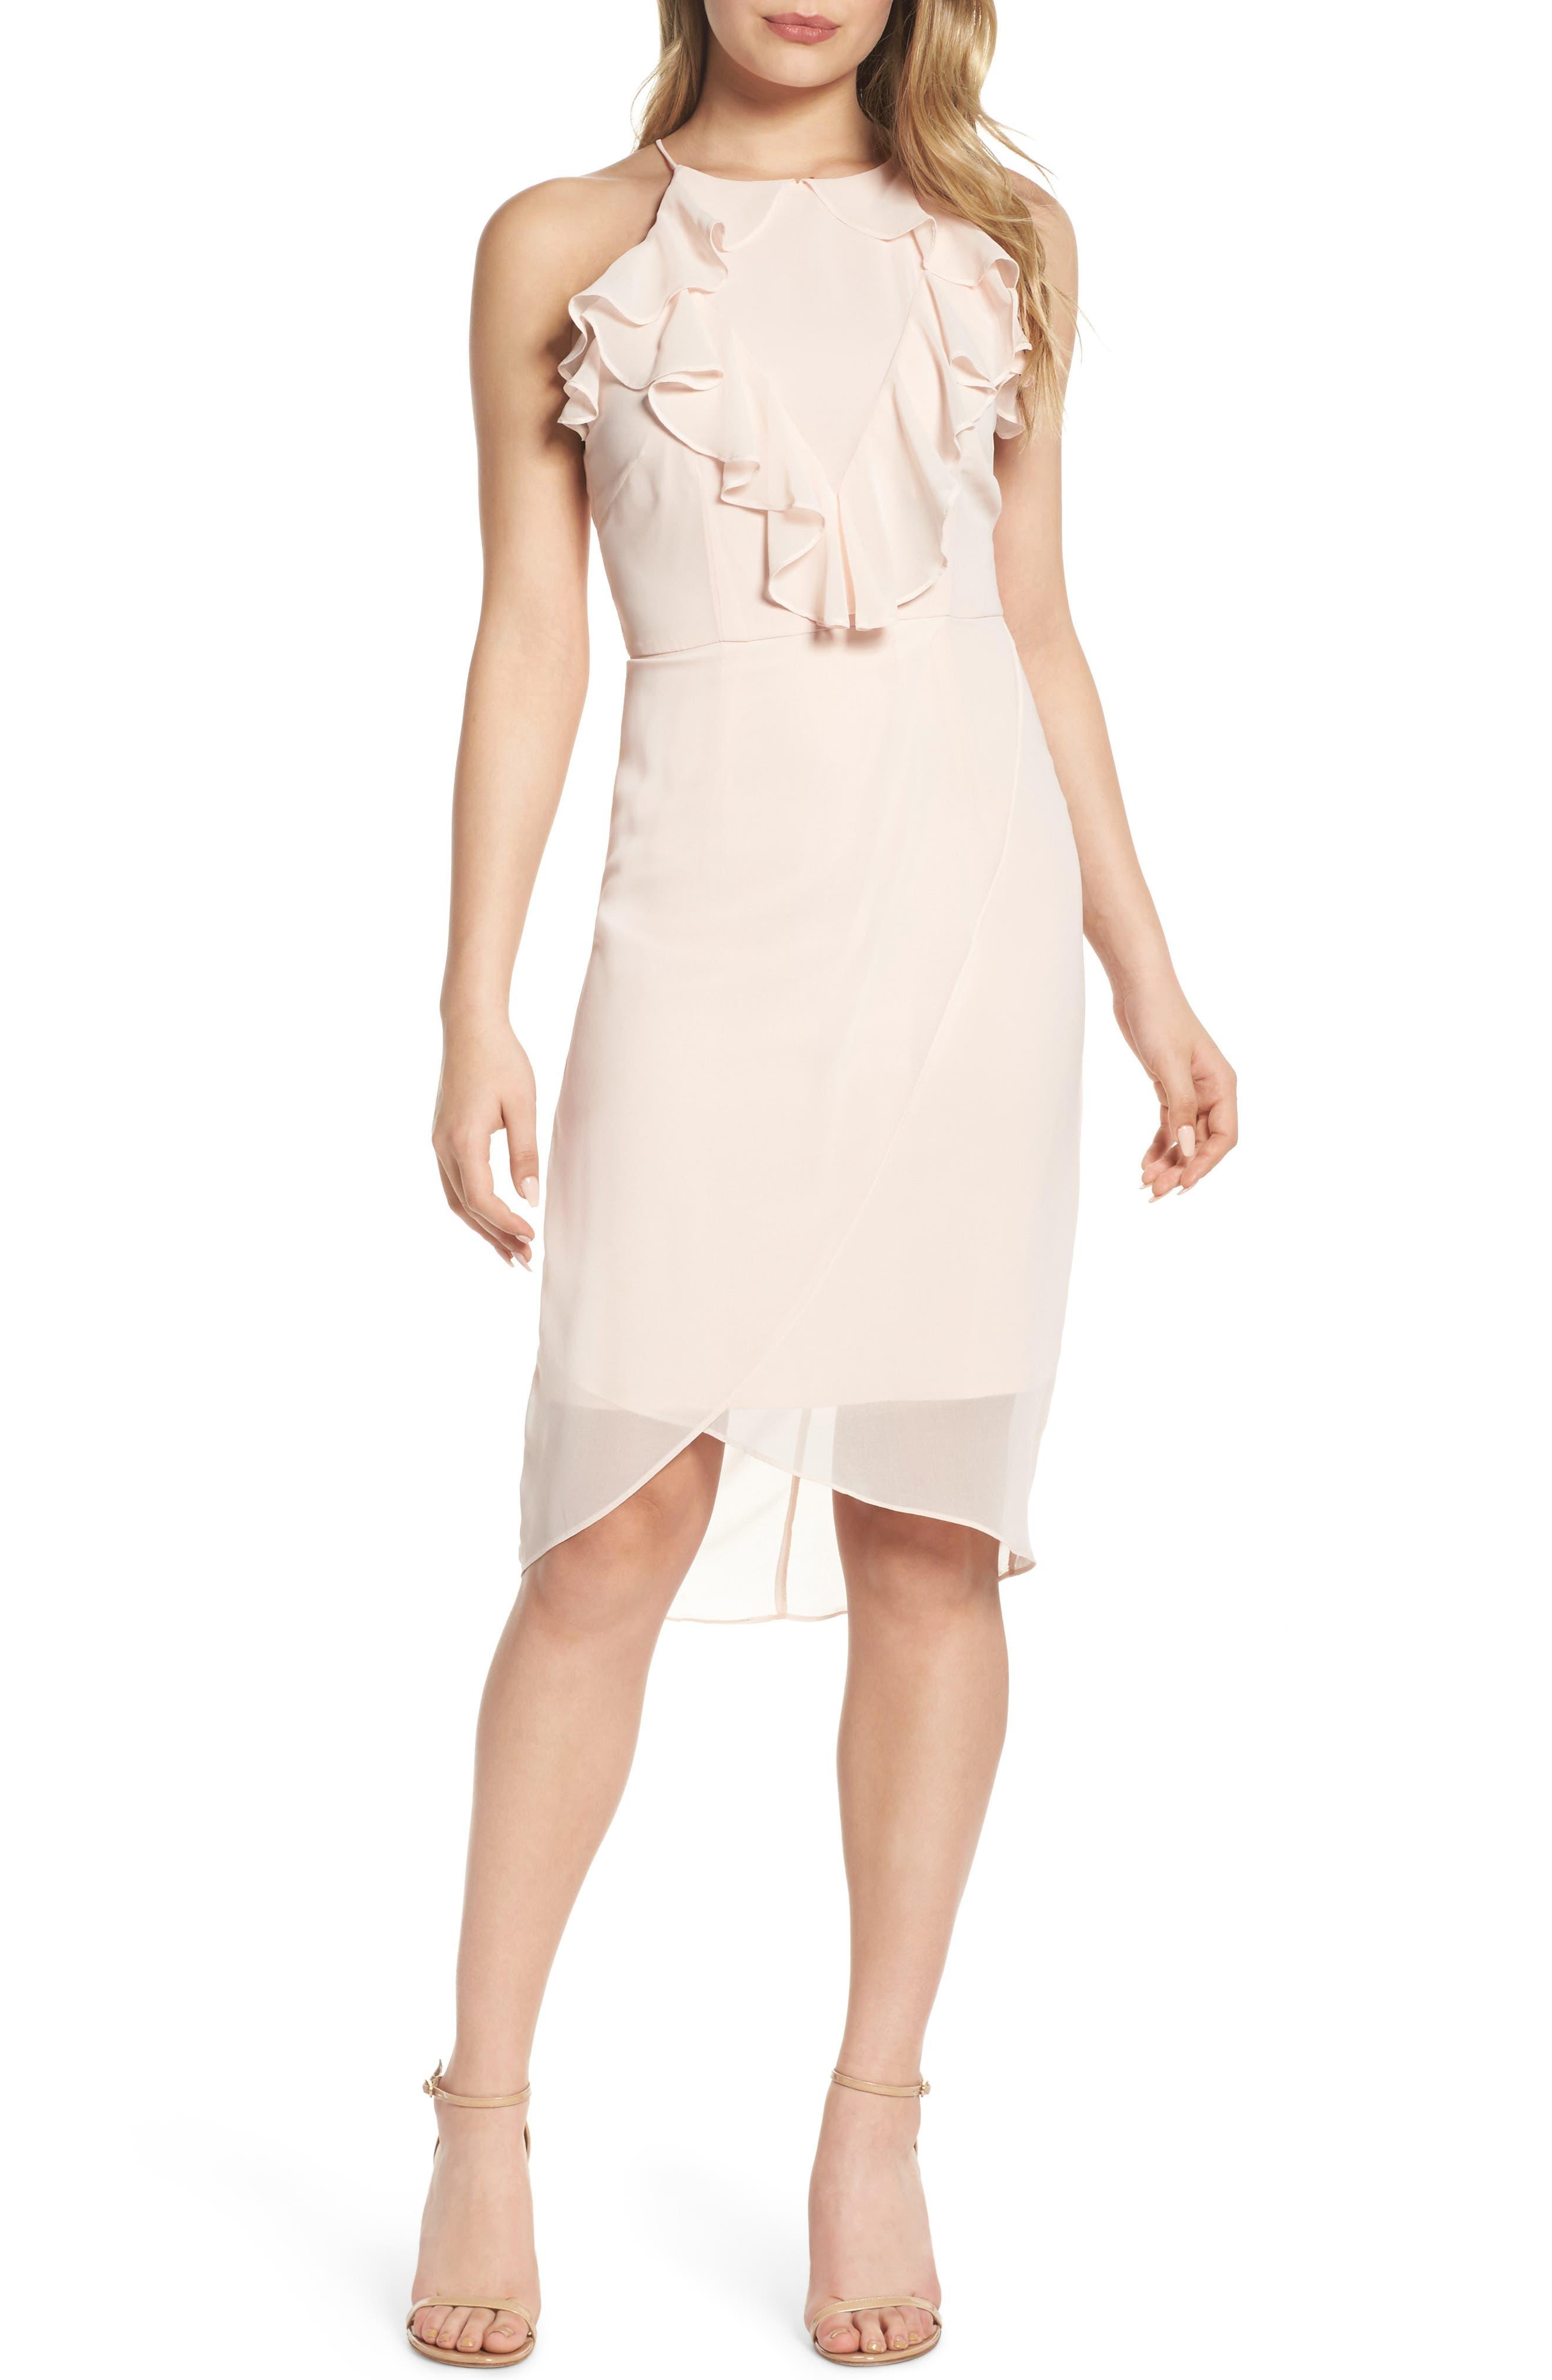 Alternate Image 1 Selected - Cooper St Mystique Charm Midi Dress